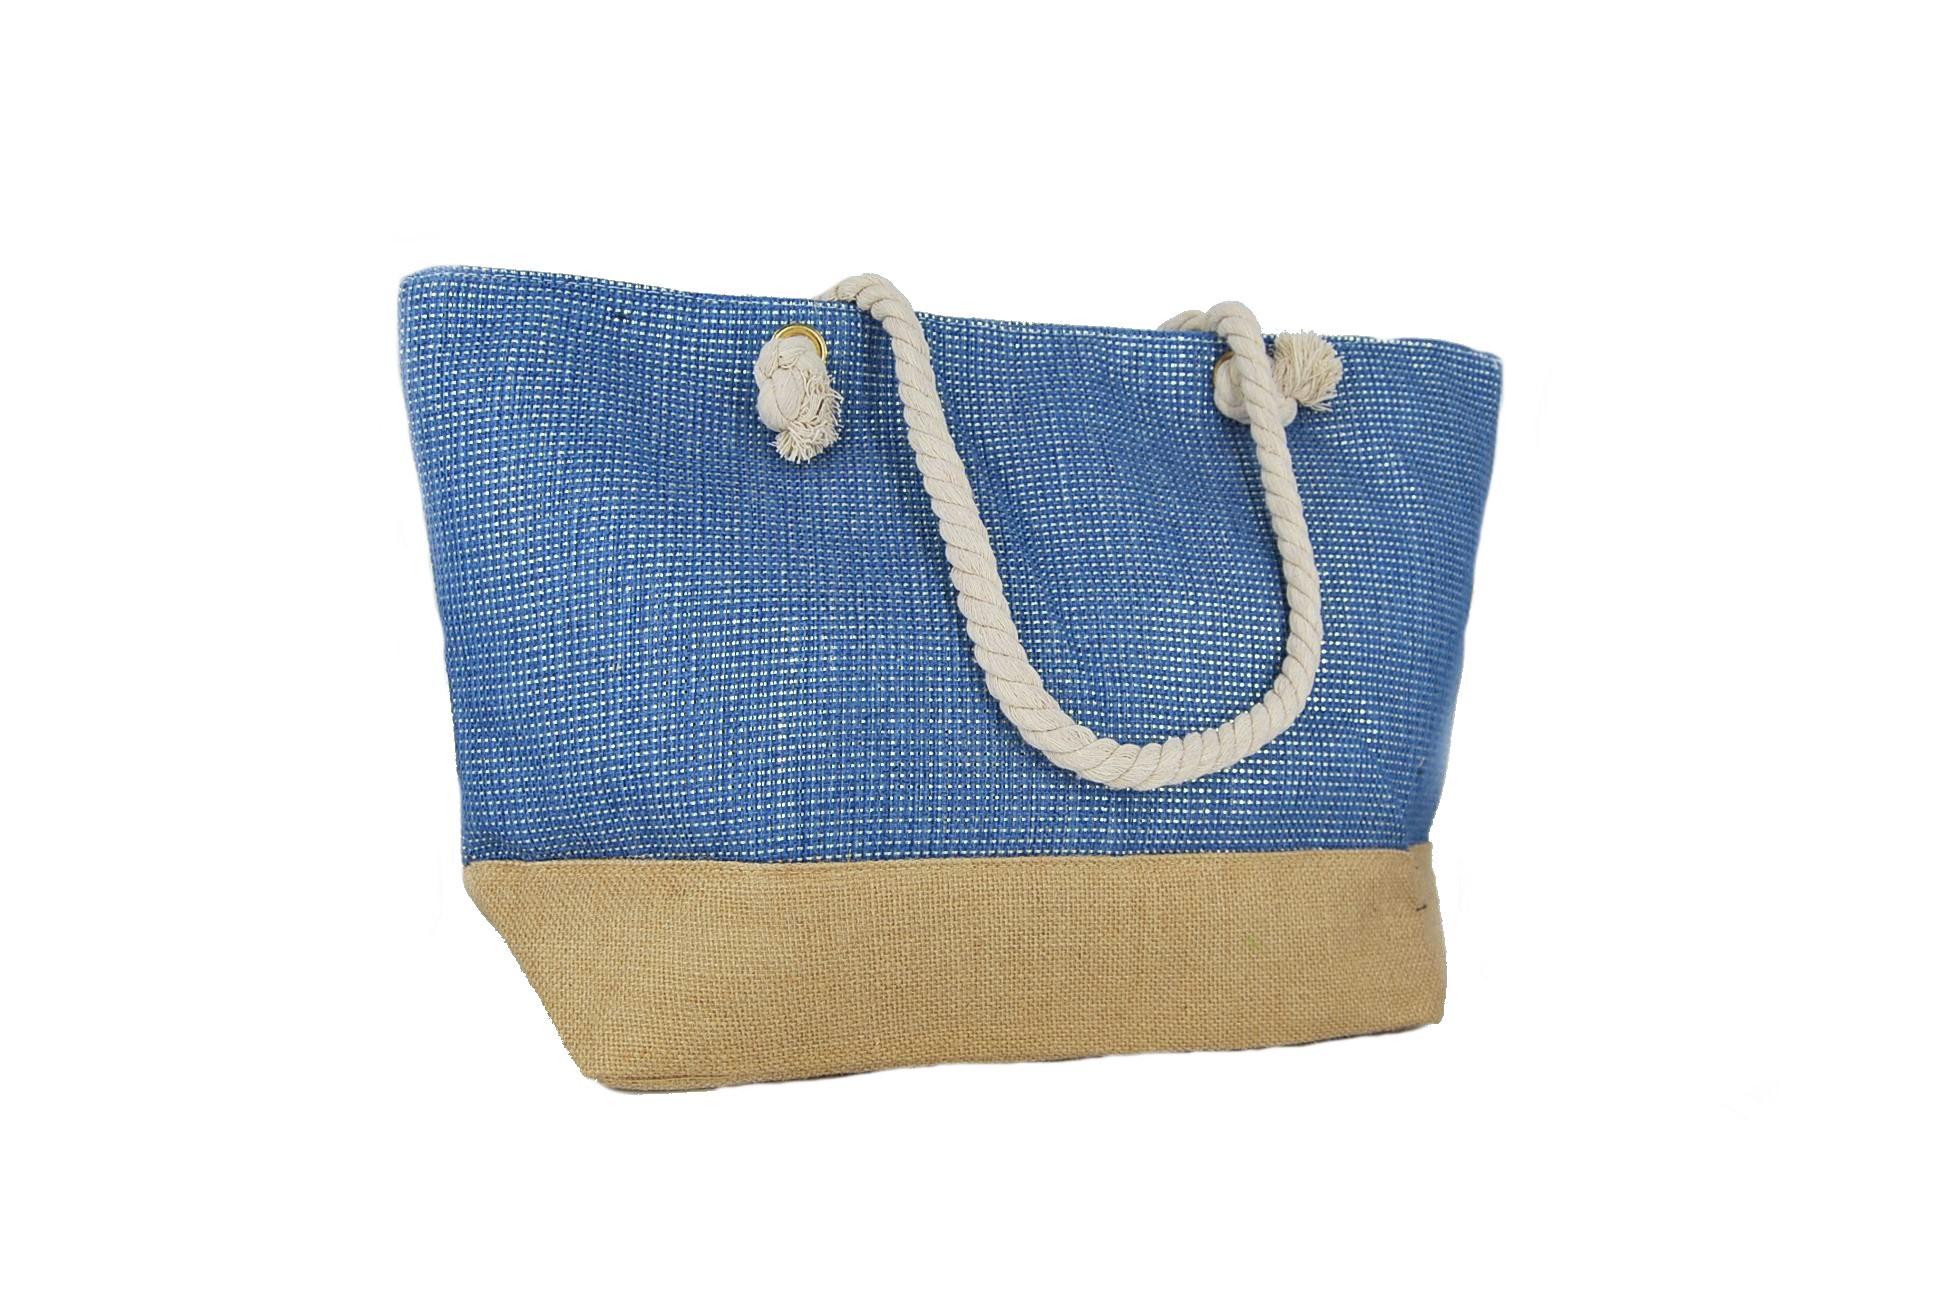 904c062392 Doca τσάντα θαλάσσης γυναικεία μπλε με χρυσές λεπτομέρειες ...